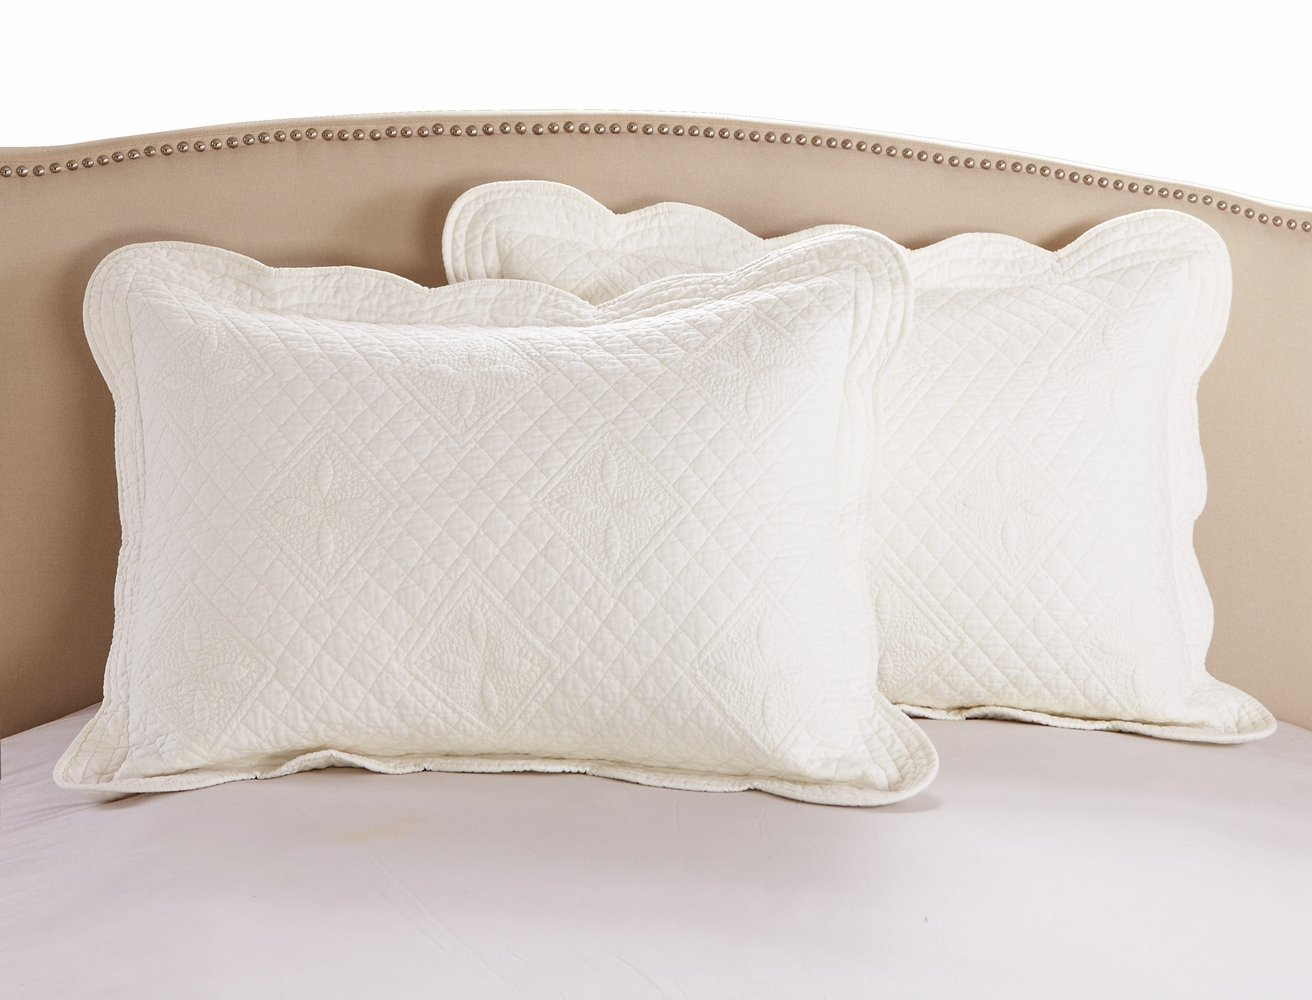 Calla Angel F9-VR8H-X19X Sage Garden Luxury Pure Cotton Quilted Pillow Sham, Ivory, Euro